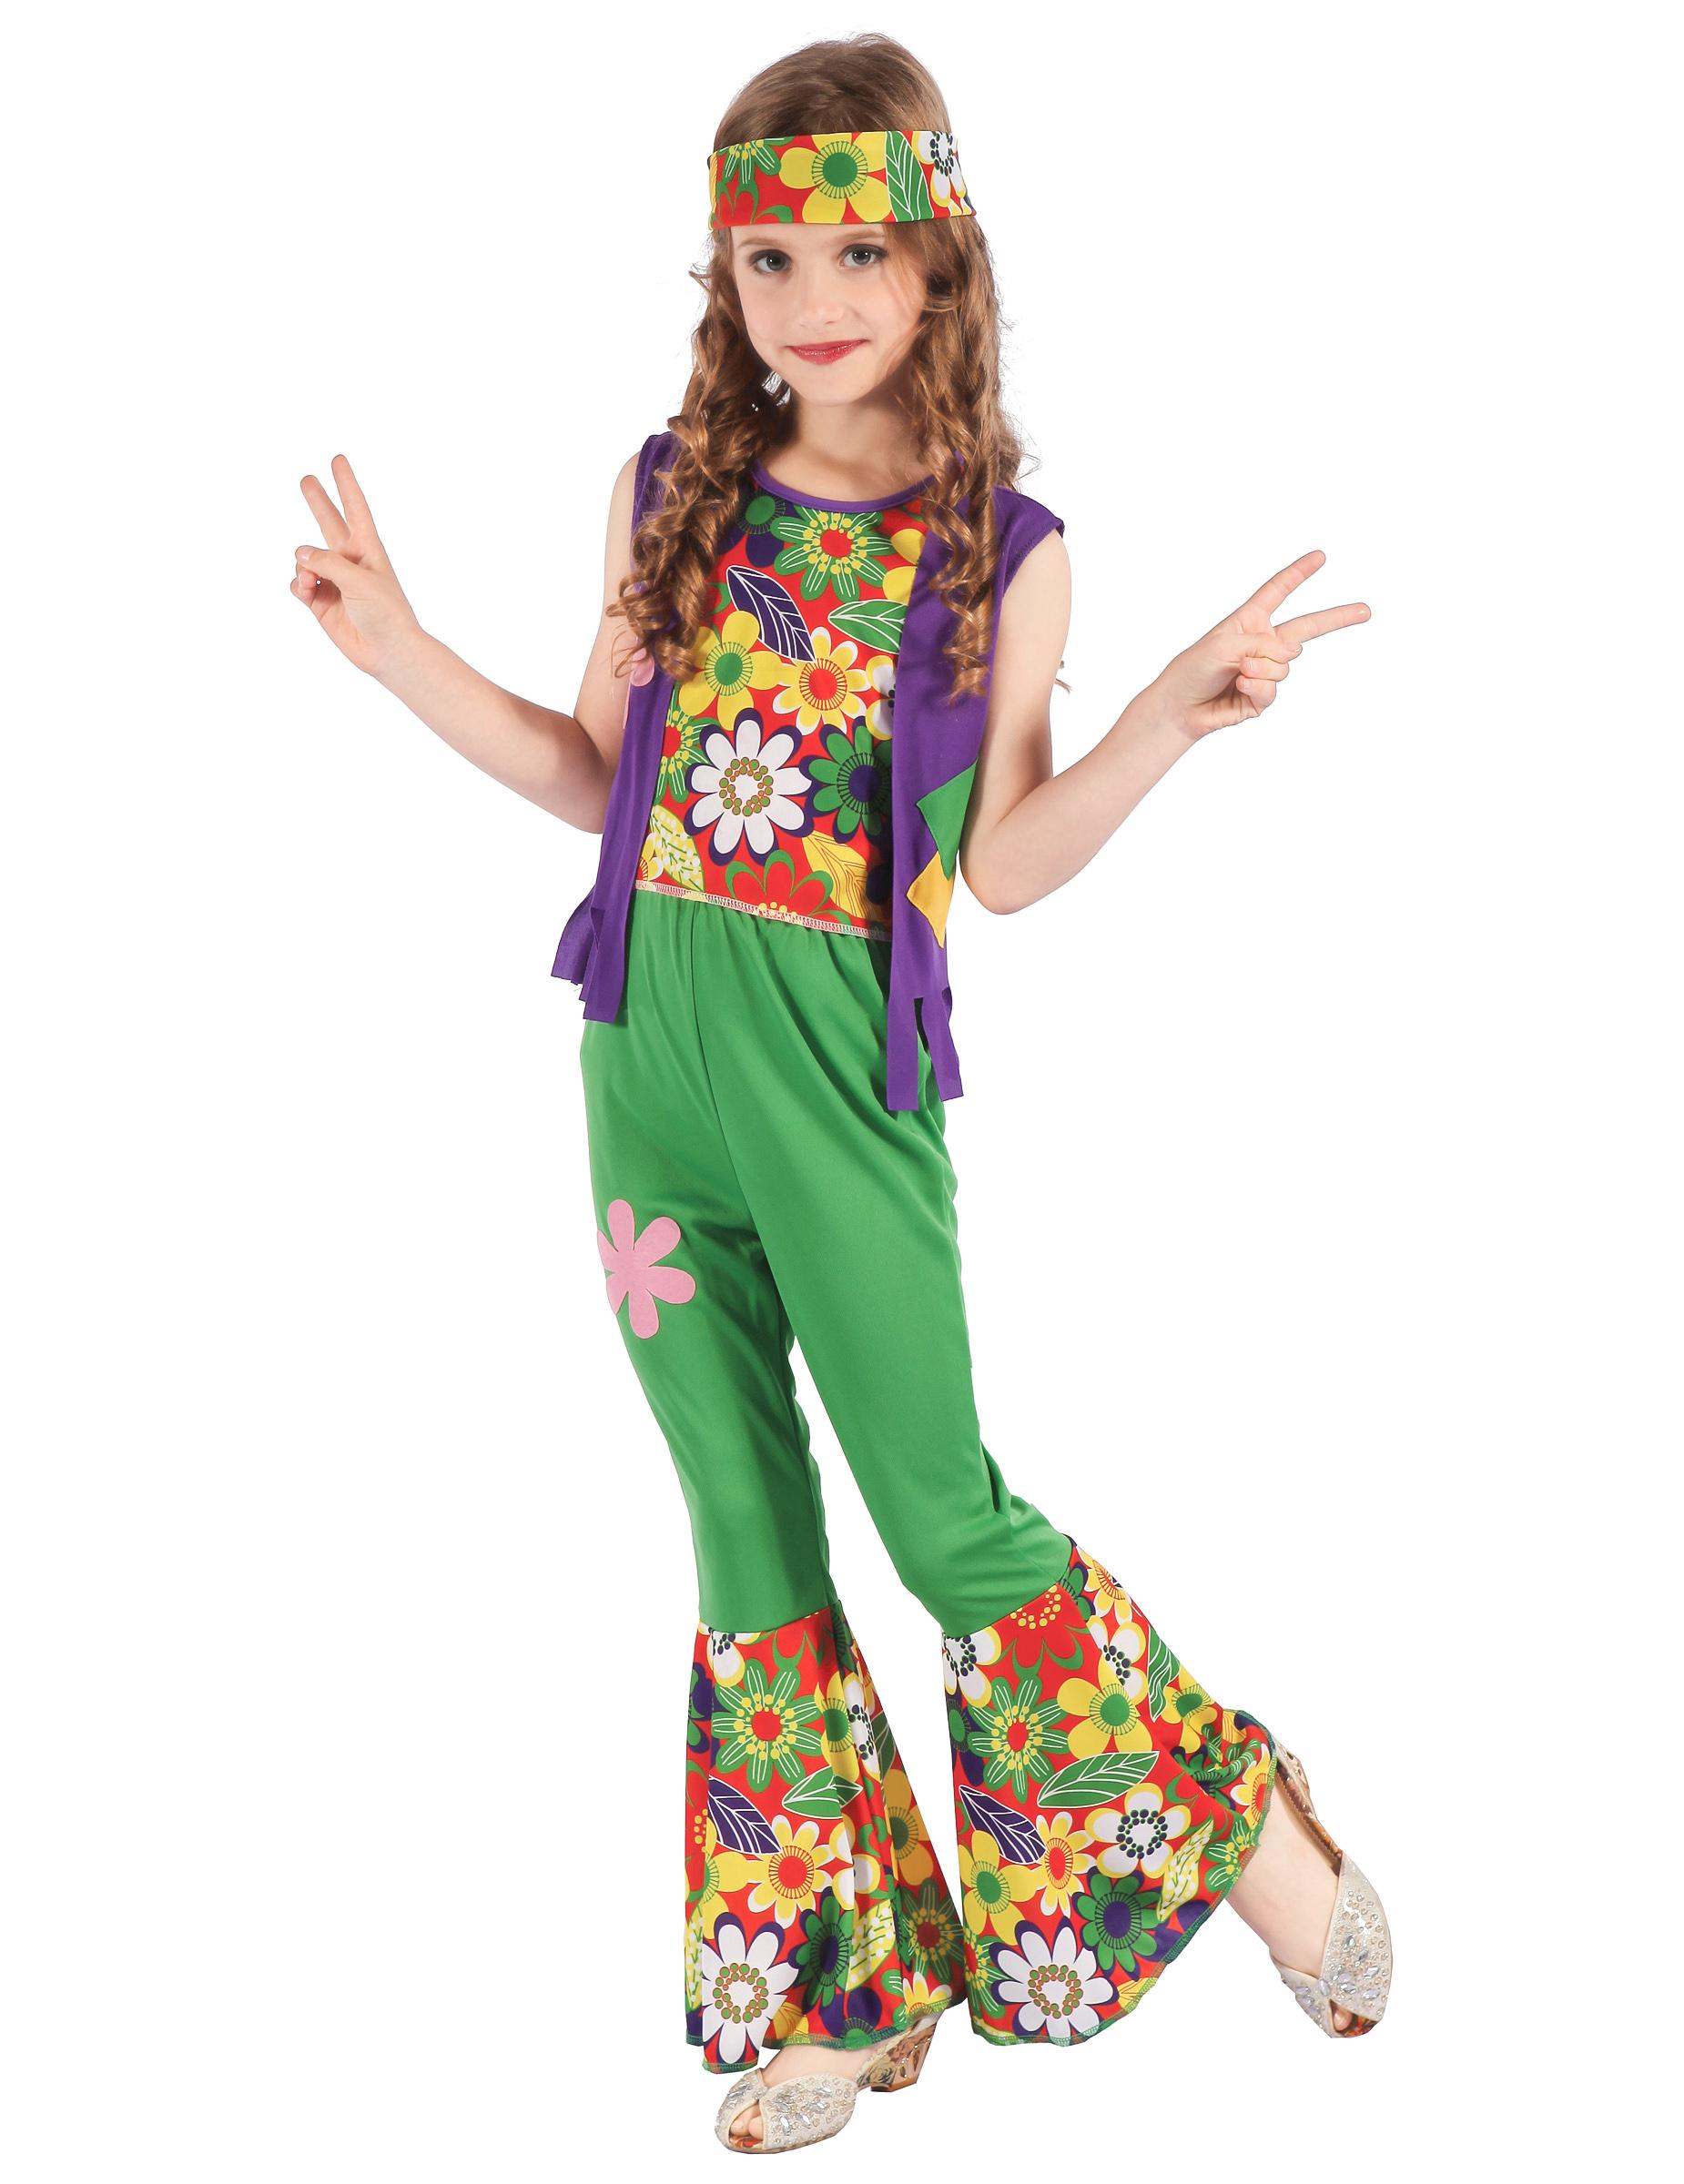 Déguisement hippie flower power vert fille   Deguise-toi, achat de ... c5b59efaf9b4